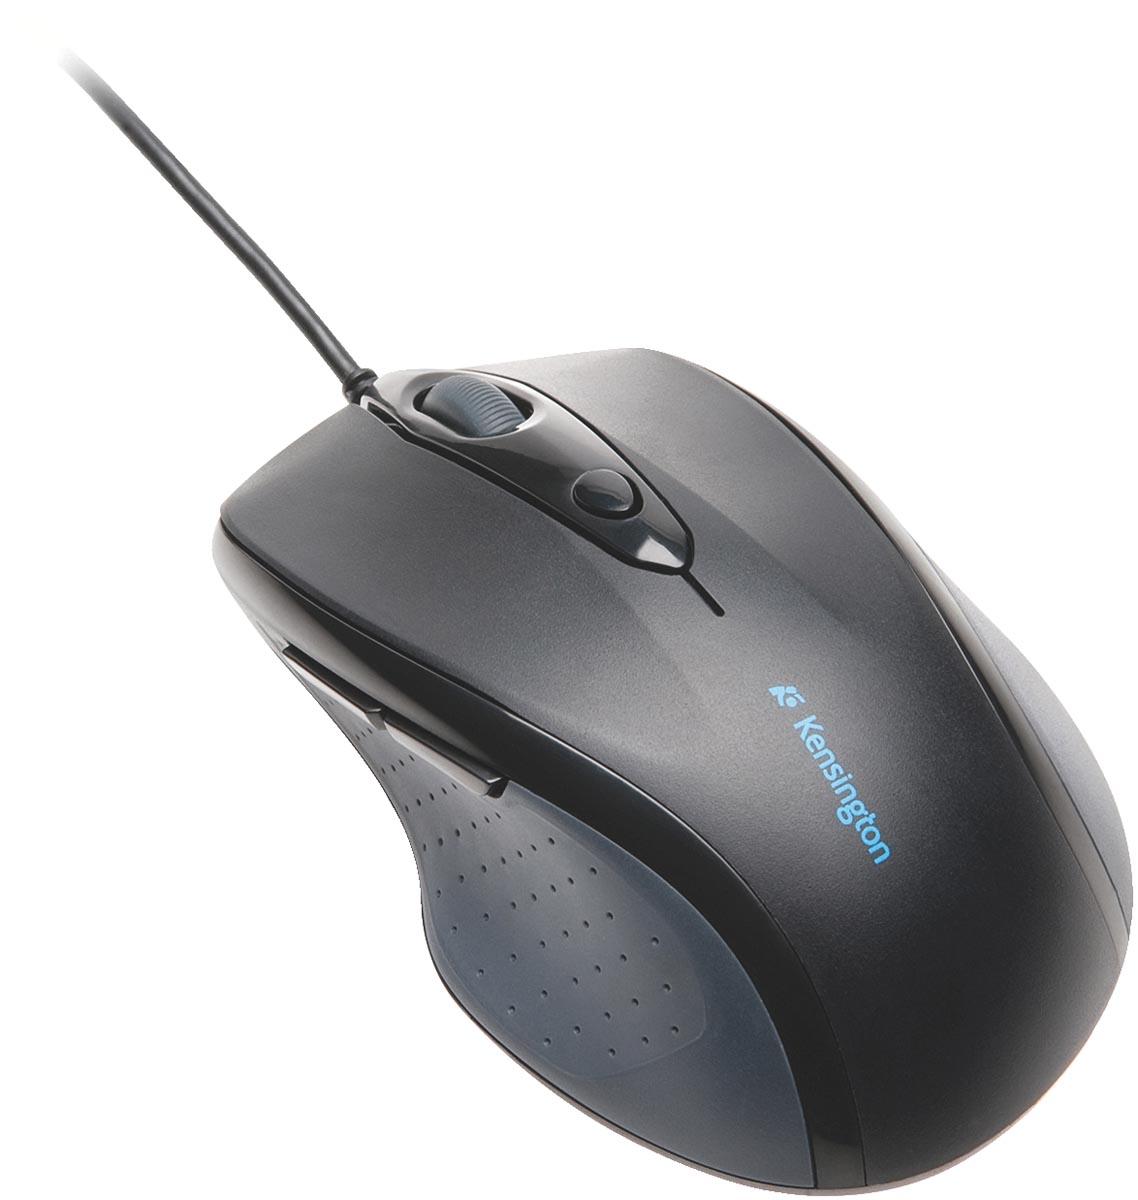 Kensington Pro Fit muis Full-Size, zwart